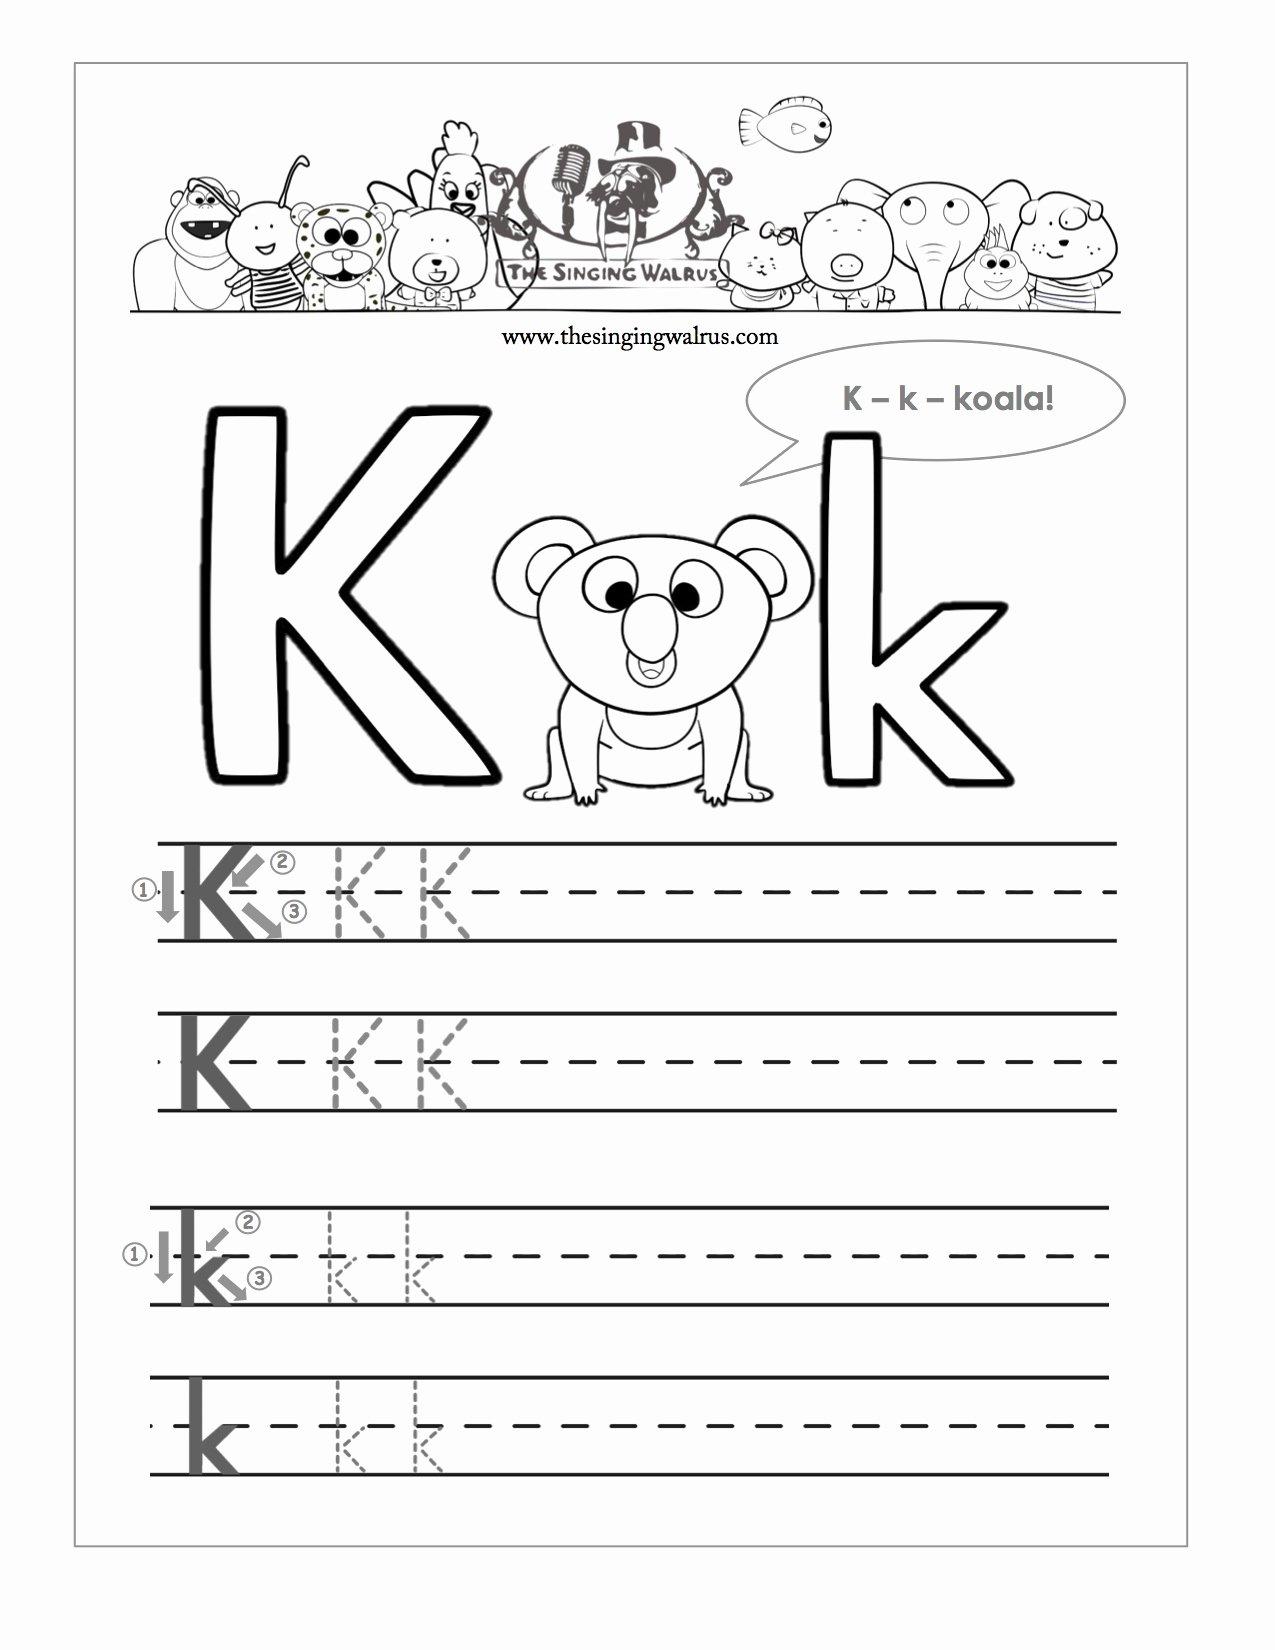 The Letter K Worksheets for Preschoolers Fresh Worksheet Letter K Preschoolets for Kindergarten Learning